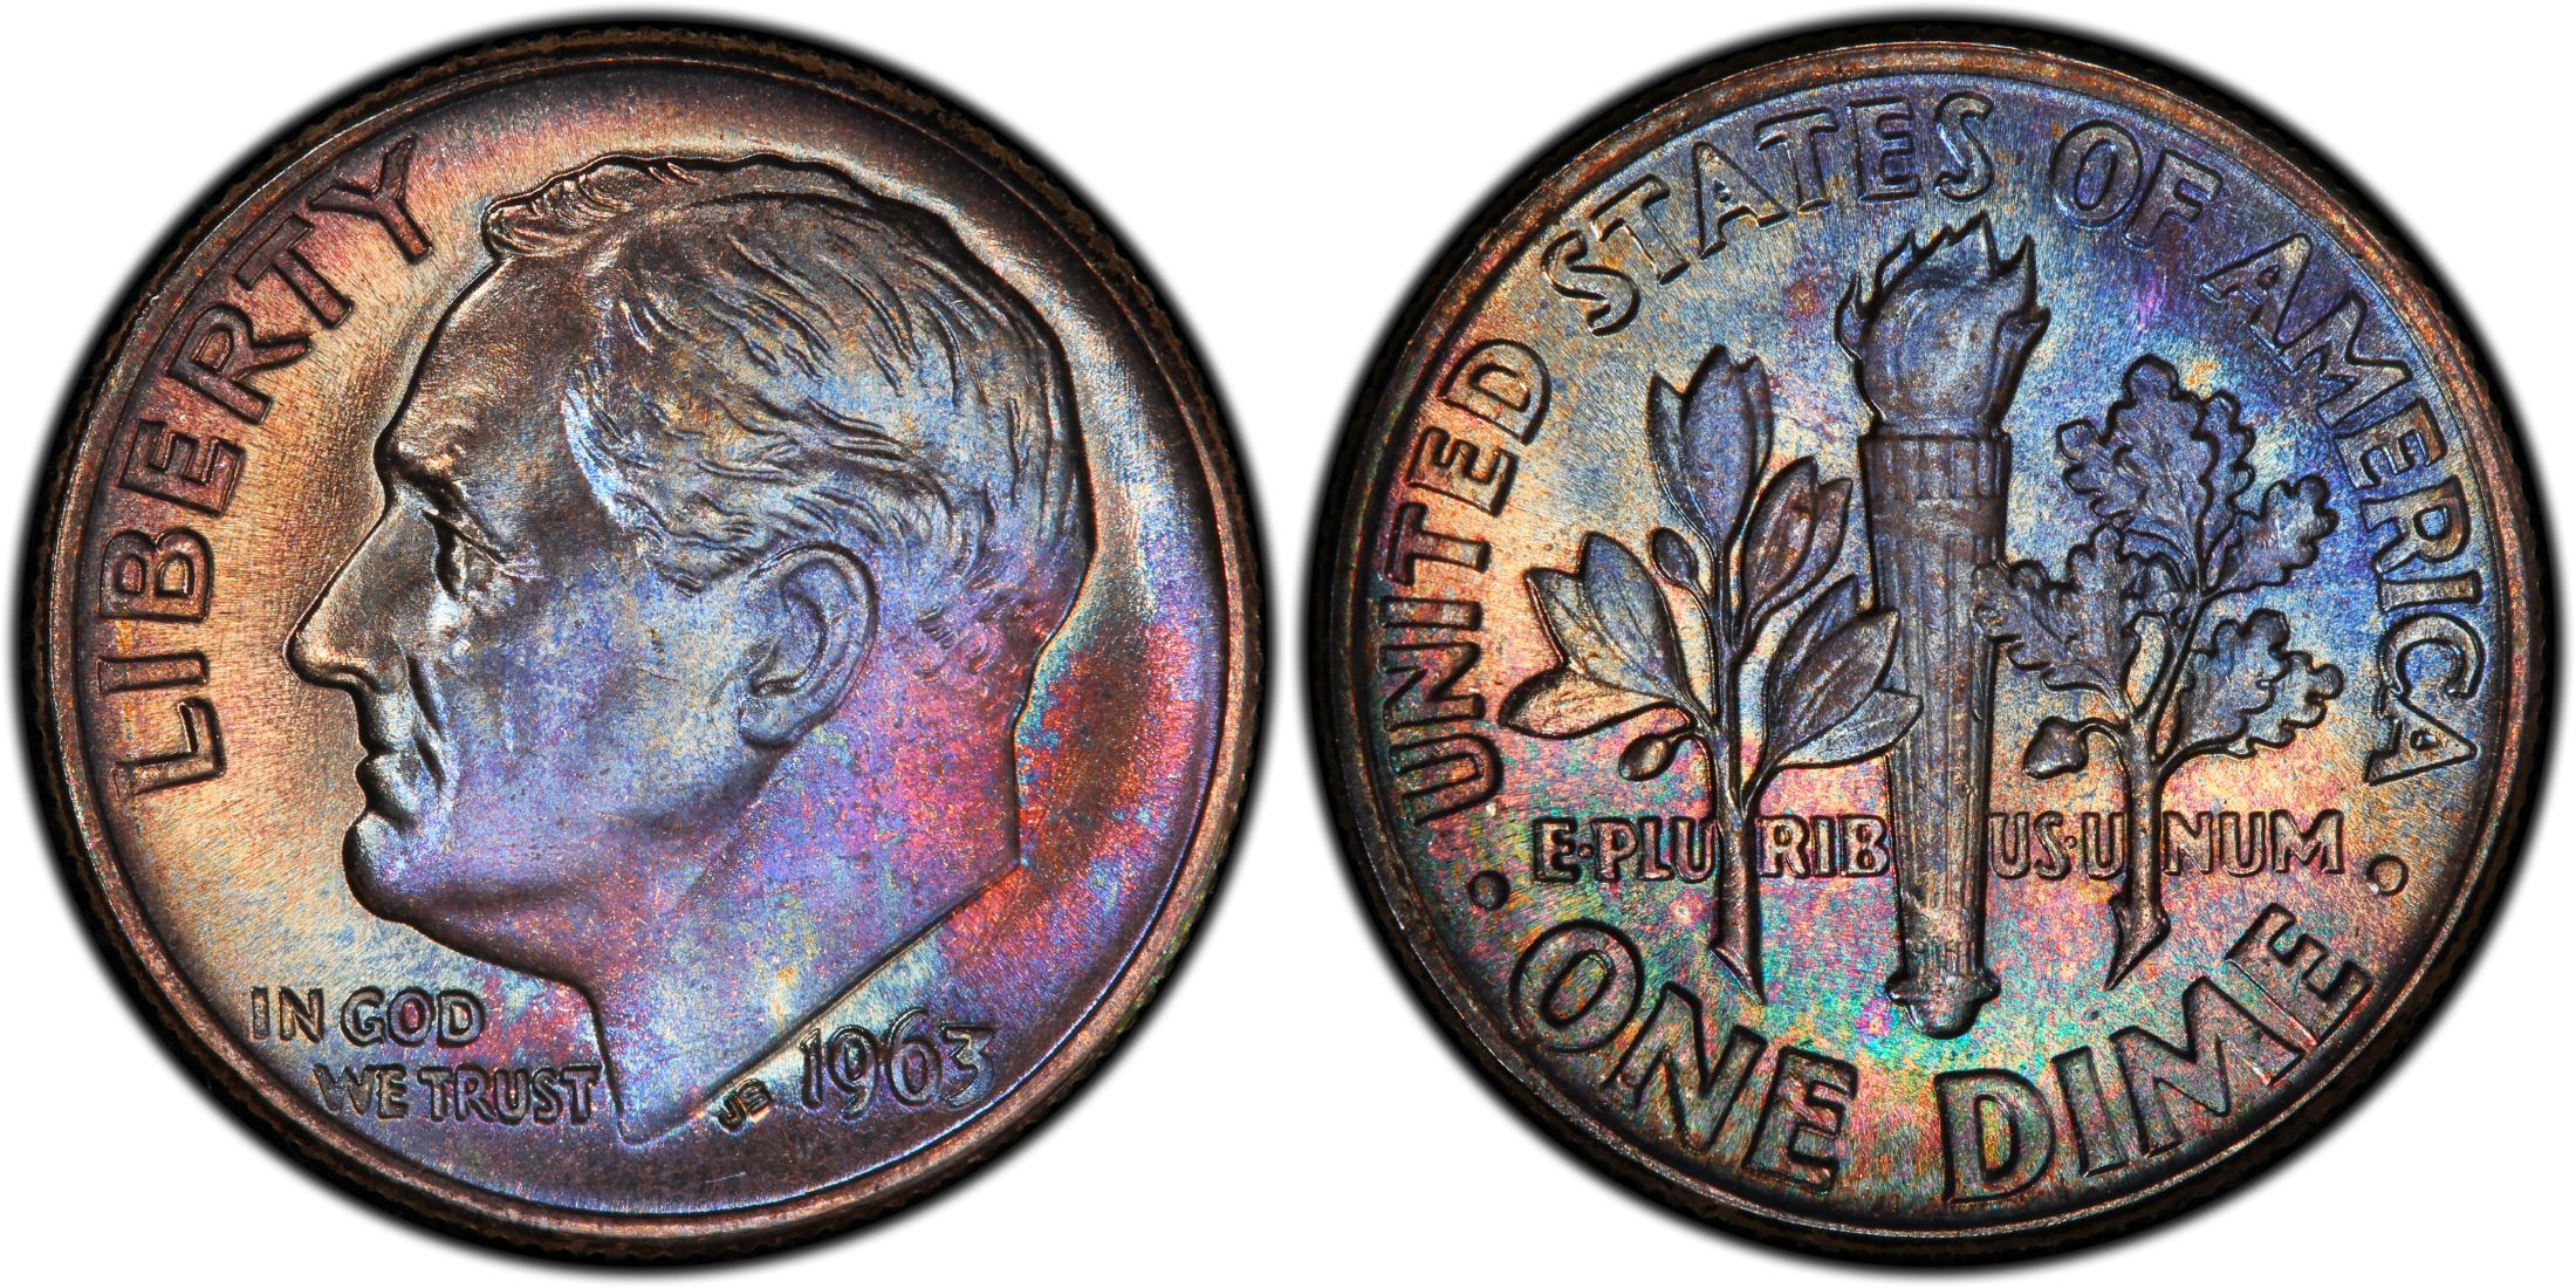 1987-S PCGS PR-70-DCAM proof Roosevelt dime deep cameo PERFECT